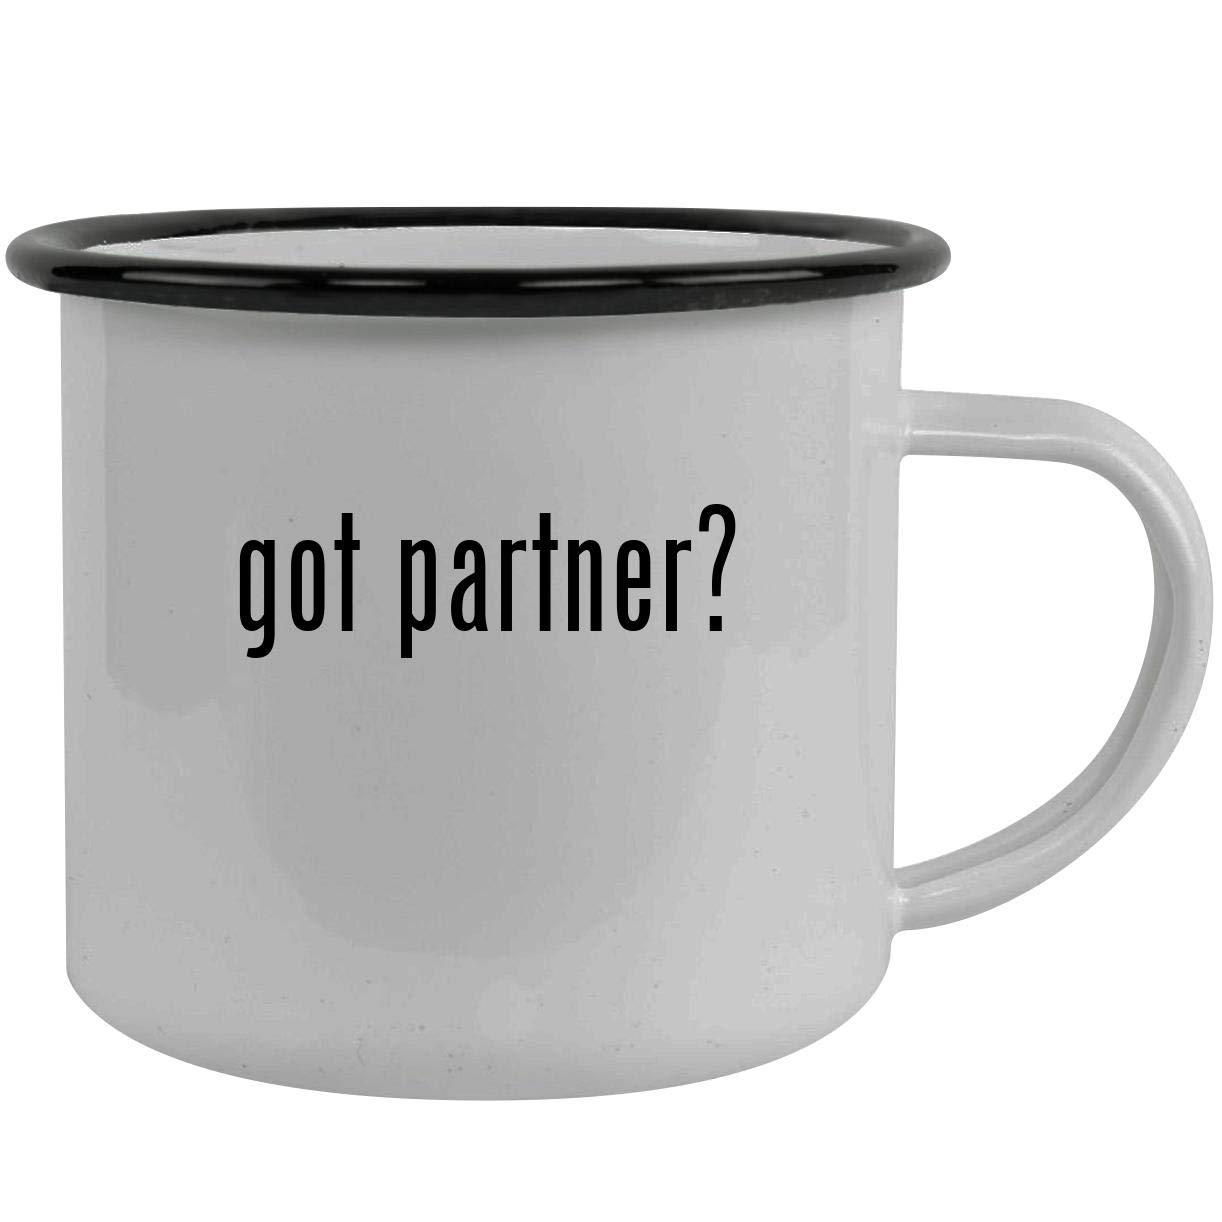 got partner? - Stainless Steel 12oz Camping Mug, Black